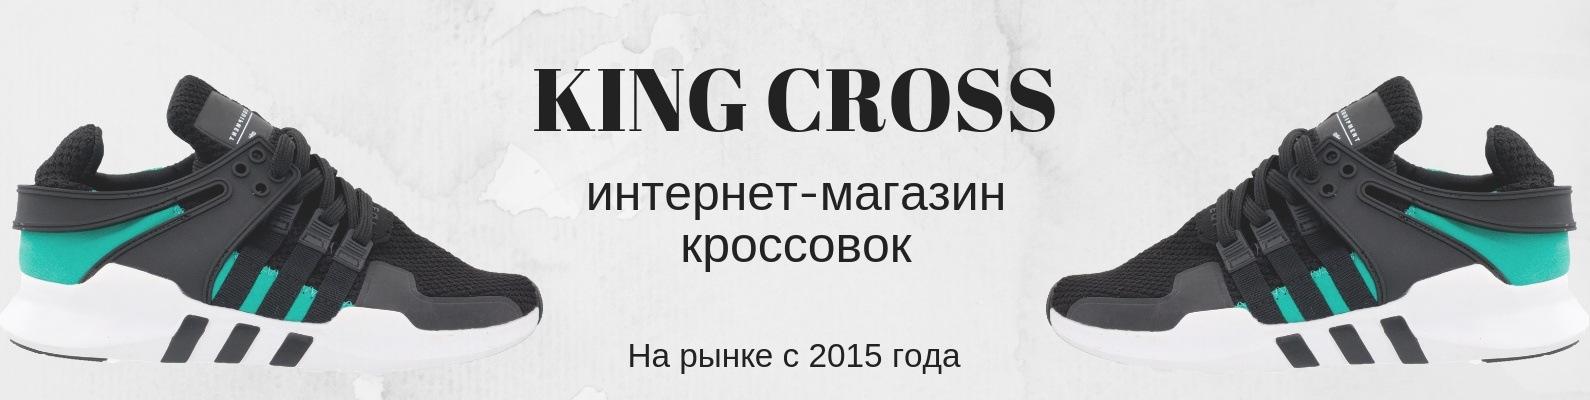 3772240e0509 KING CROSS. Интернет магазин кроссовок.   ВКонтакте